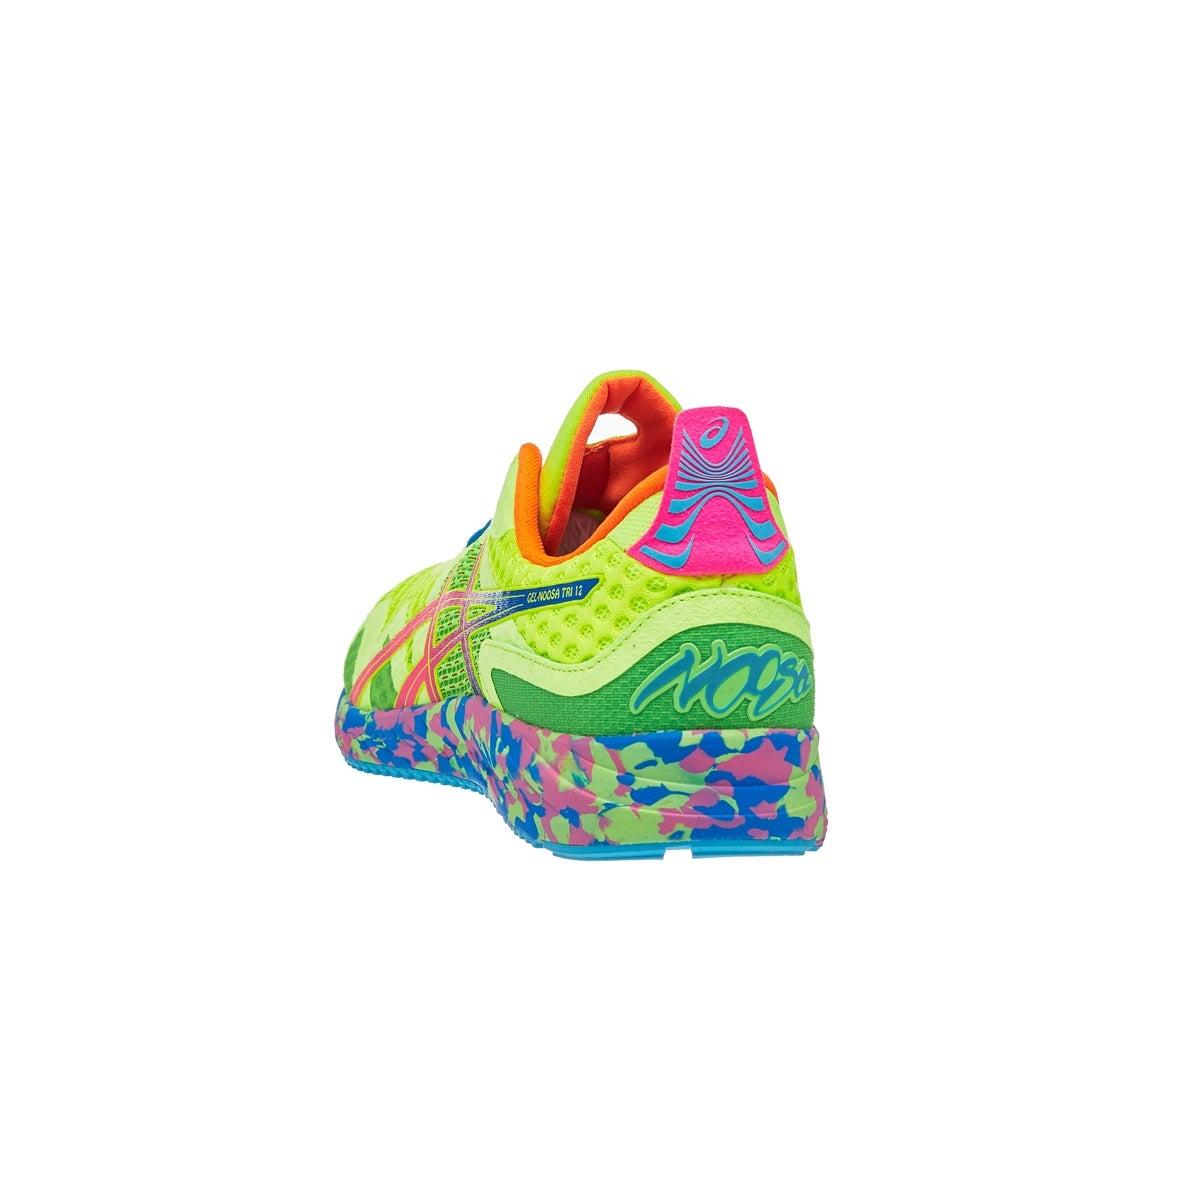 ASICS Gel Noosa Tri 12 Men's Shoes YellowGreenMulti 360